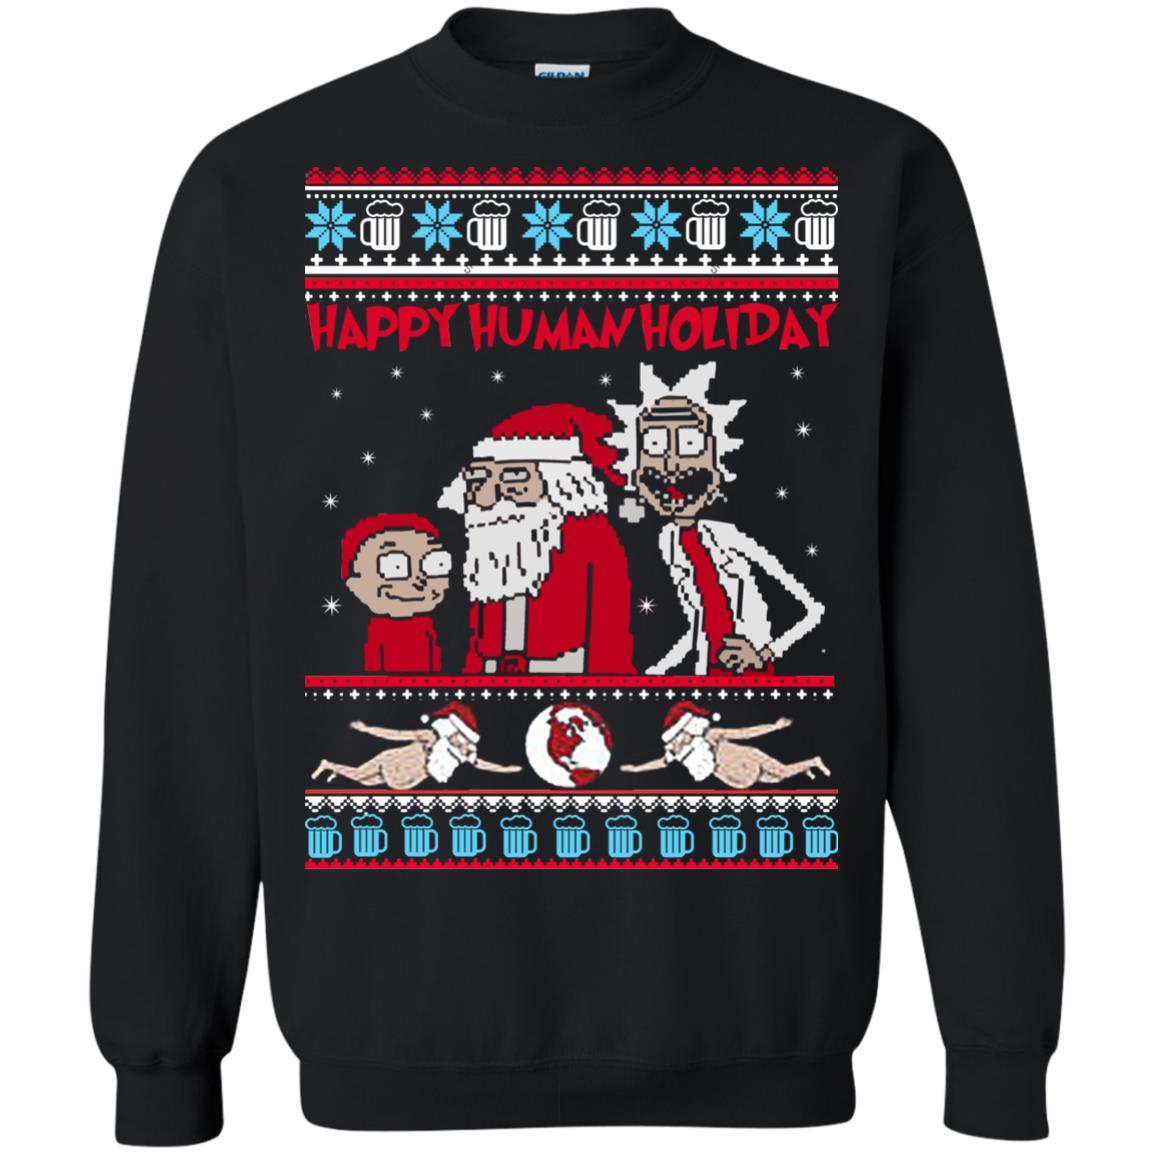 Rick And Morty Happy Human Holiday Ugly Sweater Shirt Rockatee